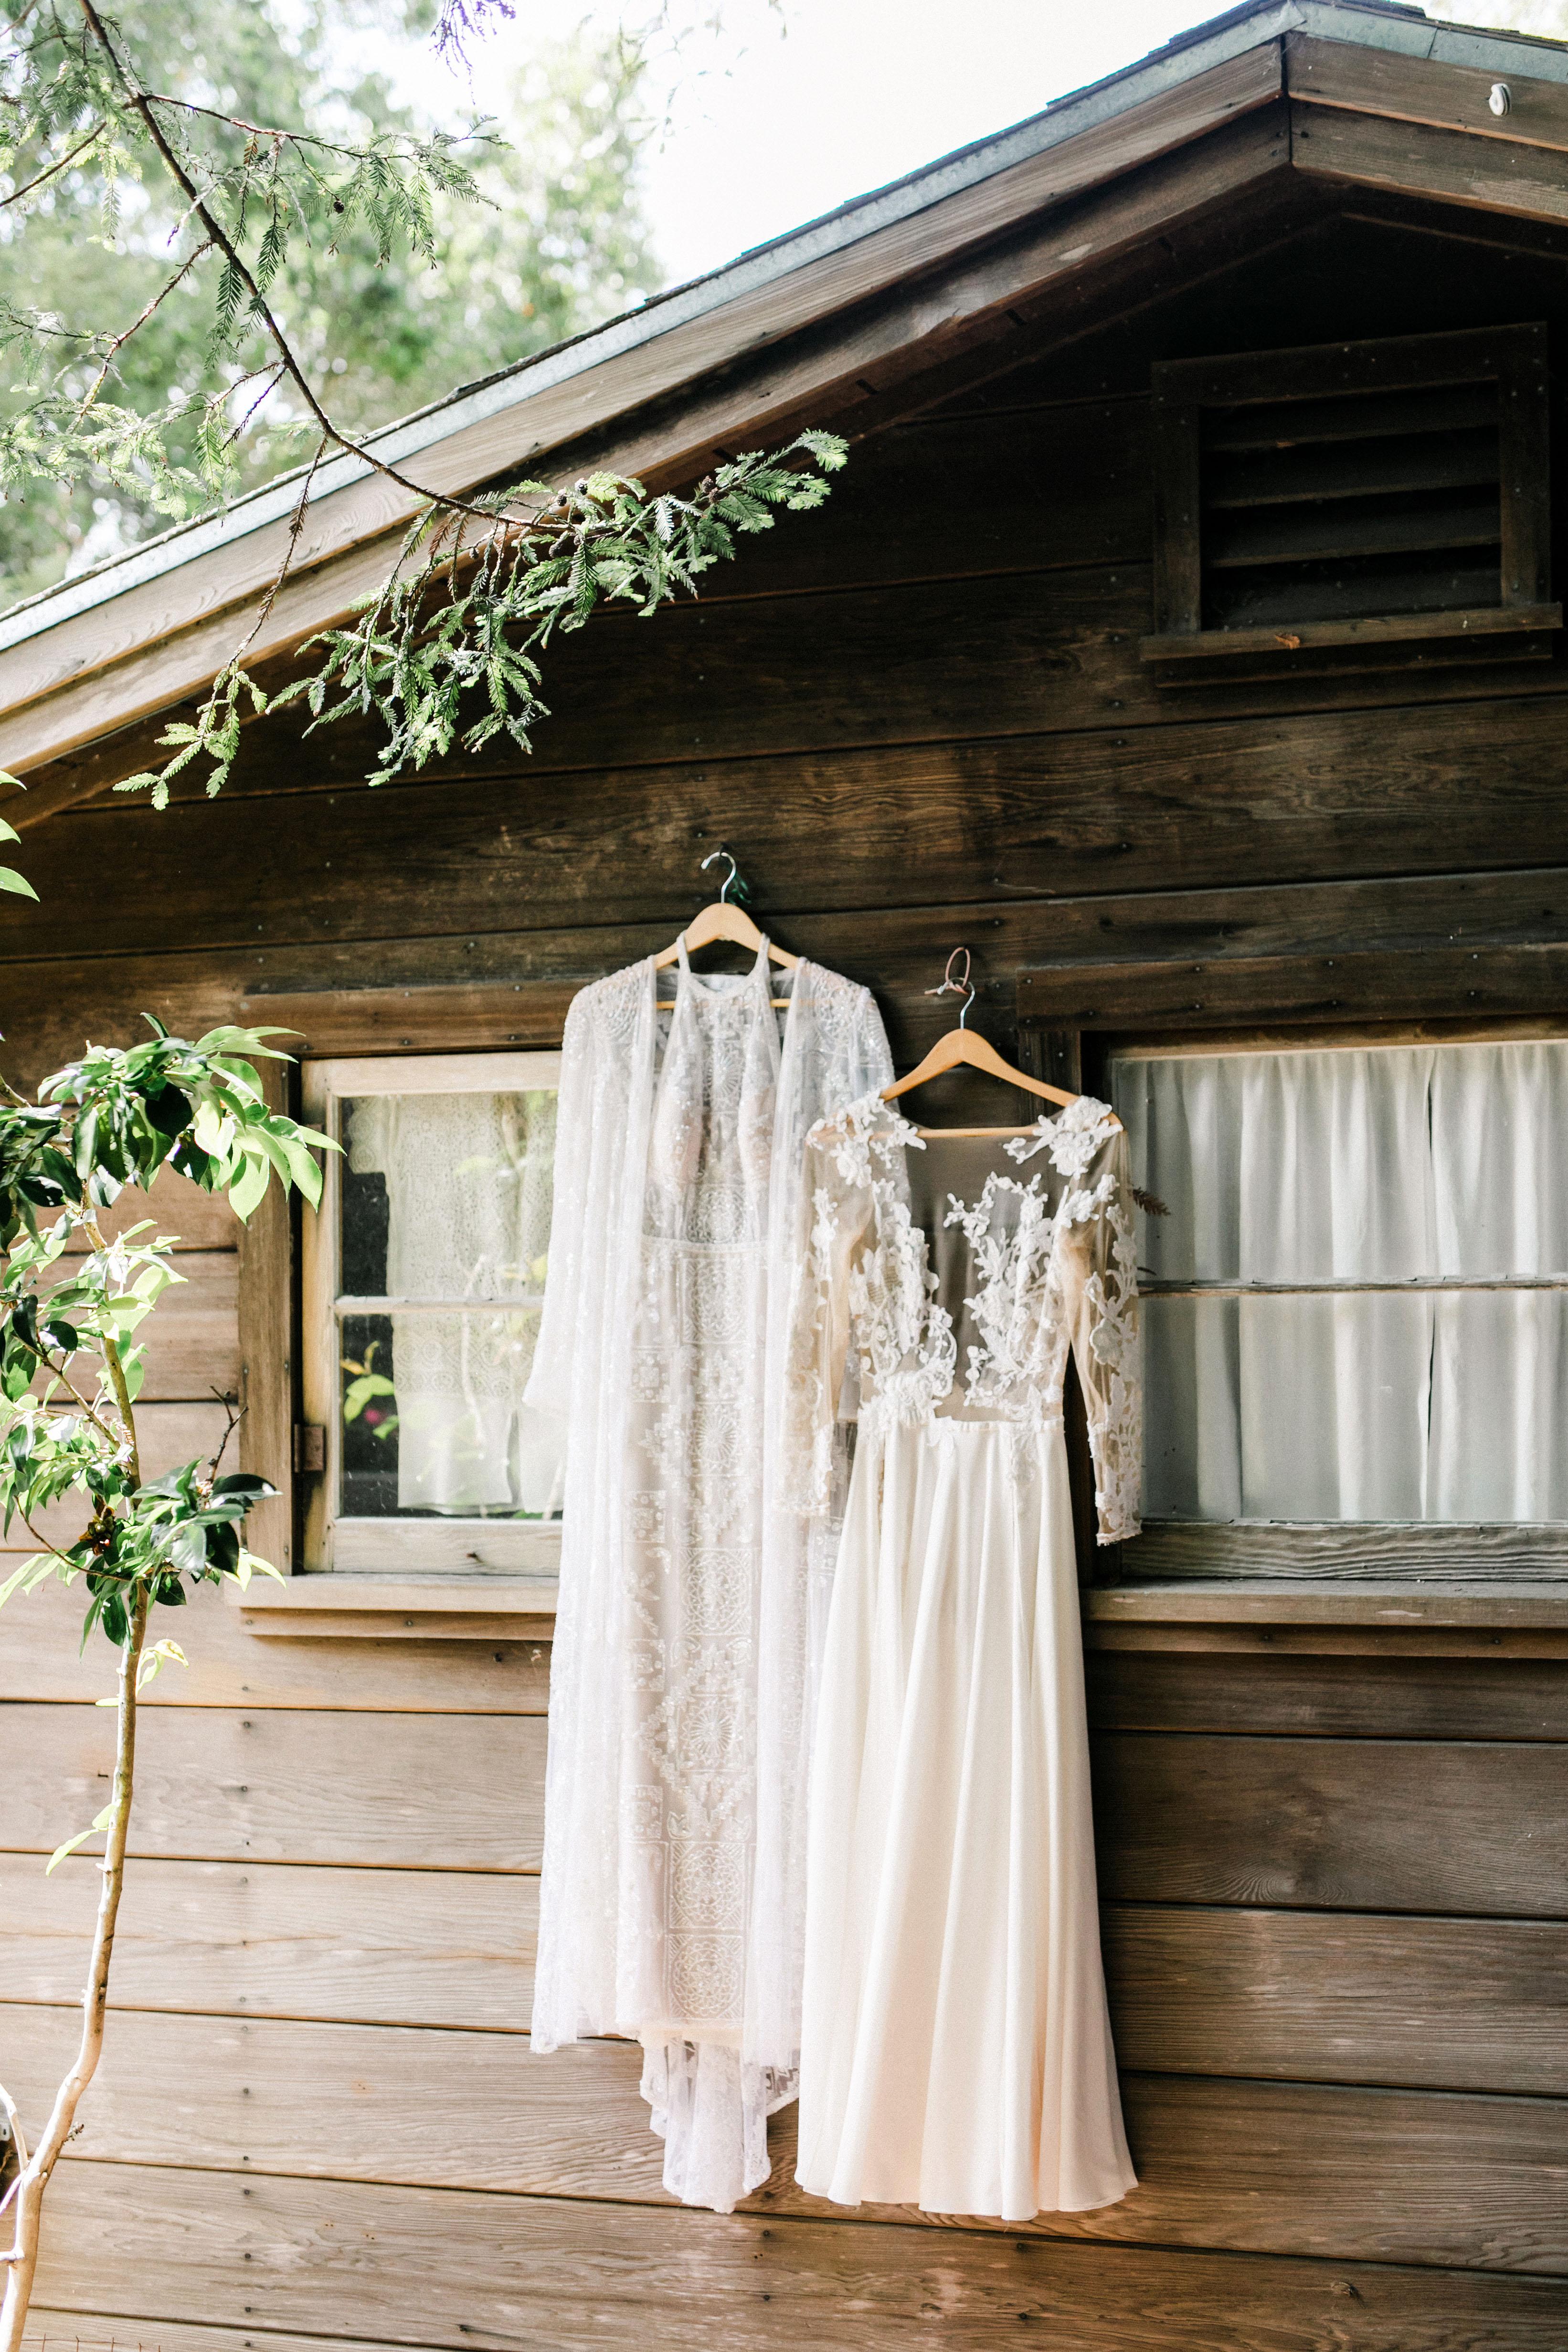 amanda chase wedding dresses hung up on cabin wall